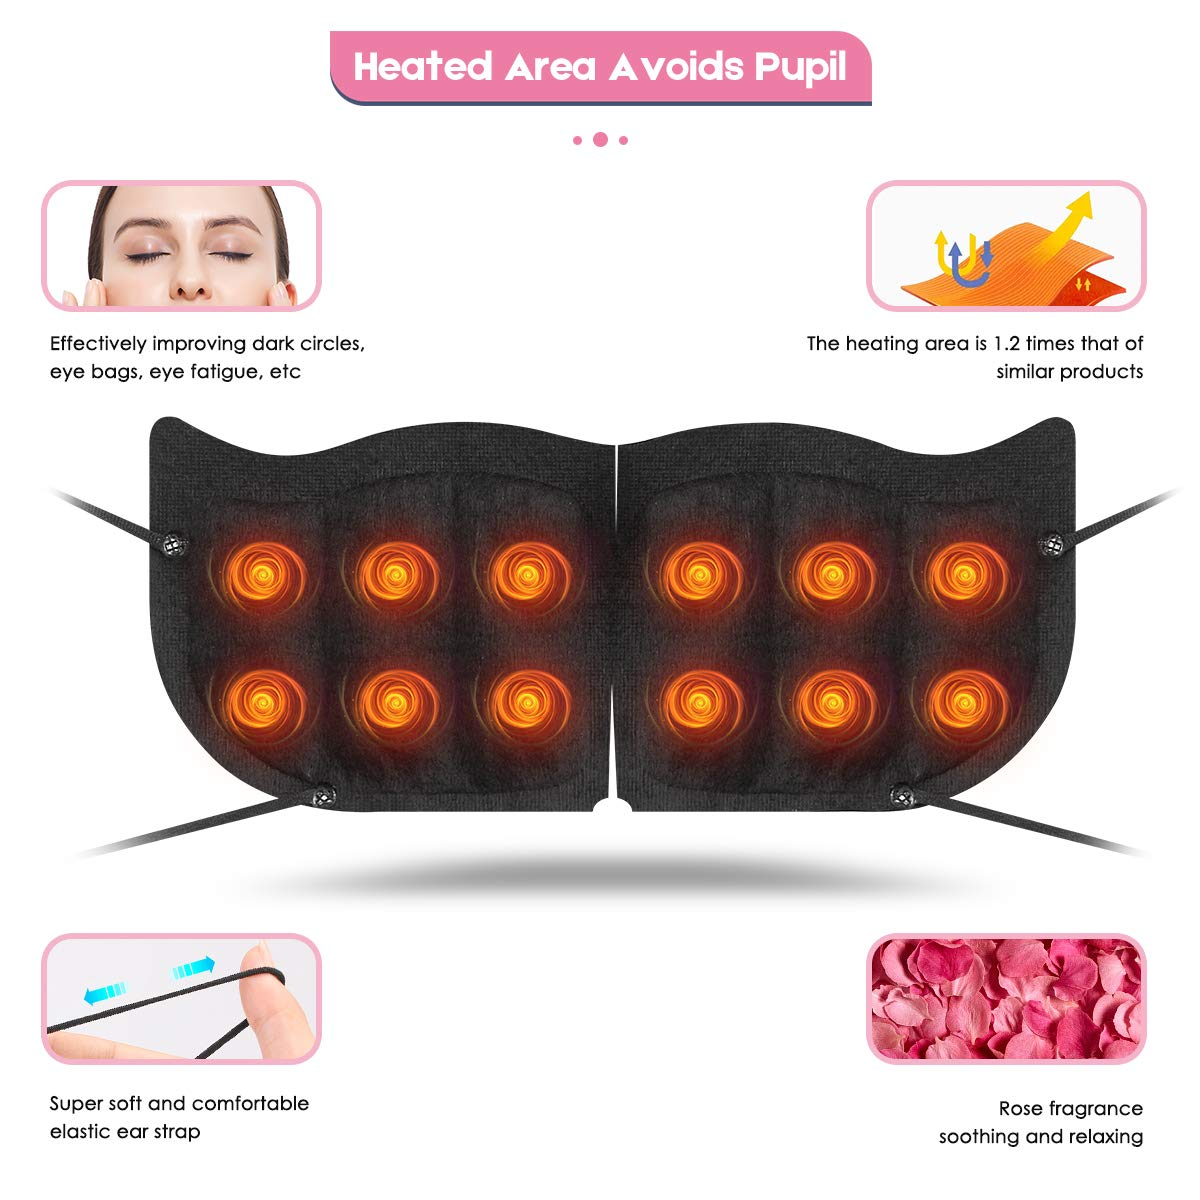 Moist Heat Eye Compress | Steam Eye Mask for Dry Eyes, Help Sleep, Blackout, Breathable, Relieves Eyestrain Fatigue Dryness Soreness, Men Women, 20 Sheets